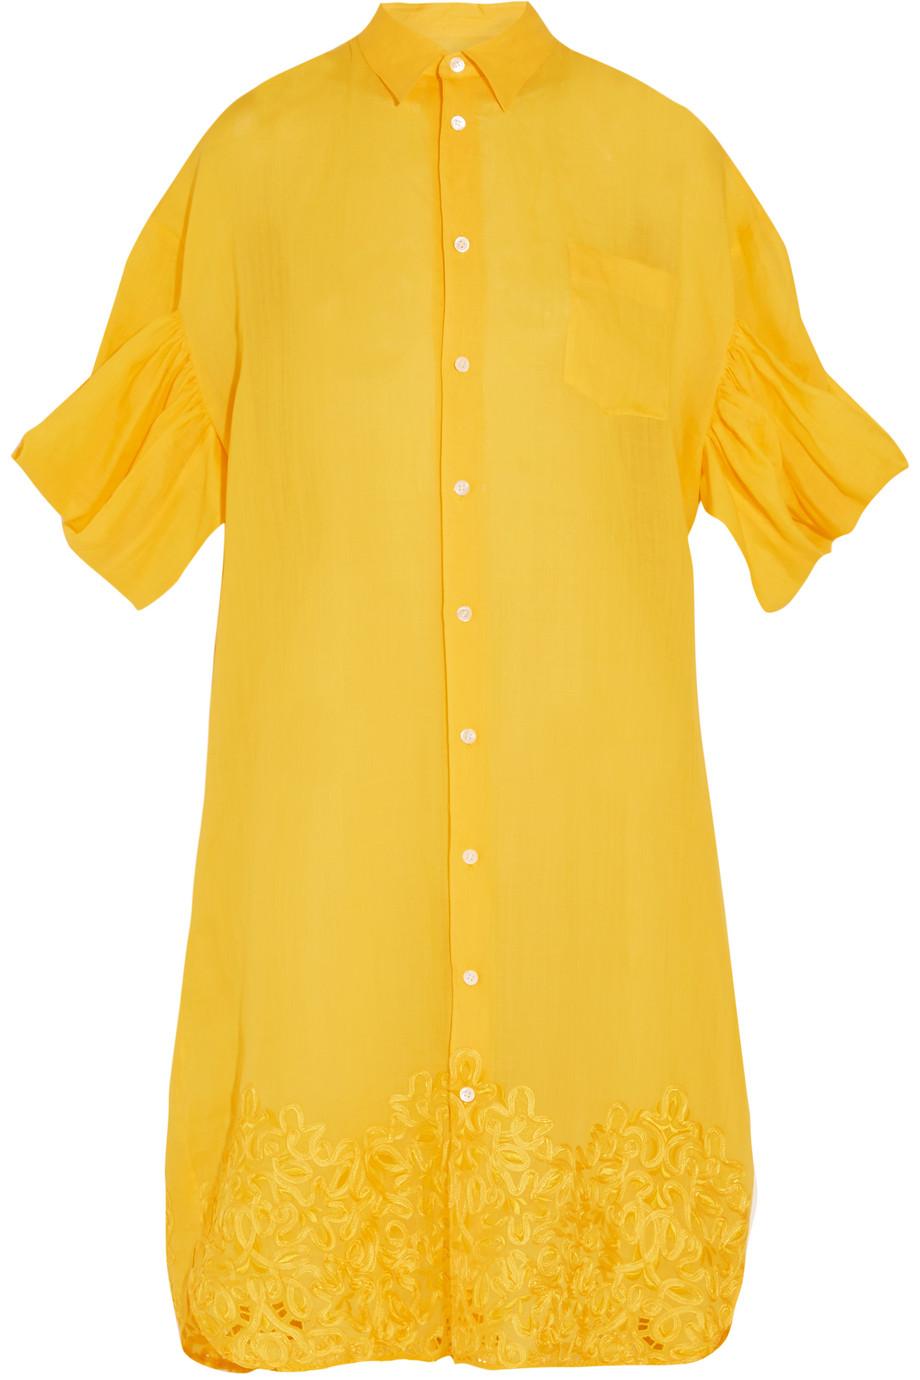 Junya Watanabe Oversized Embroidered Linen Shirt Dress, Bright Yellow, Women's - Embroidered, Size: XS